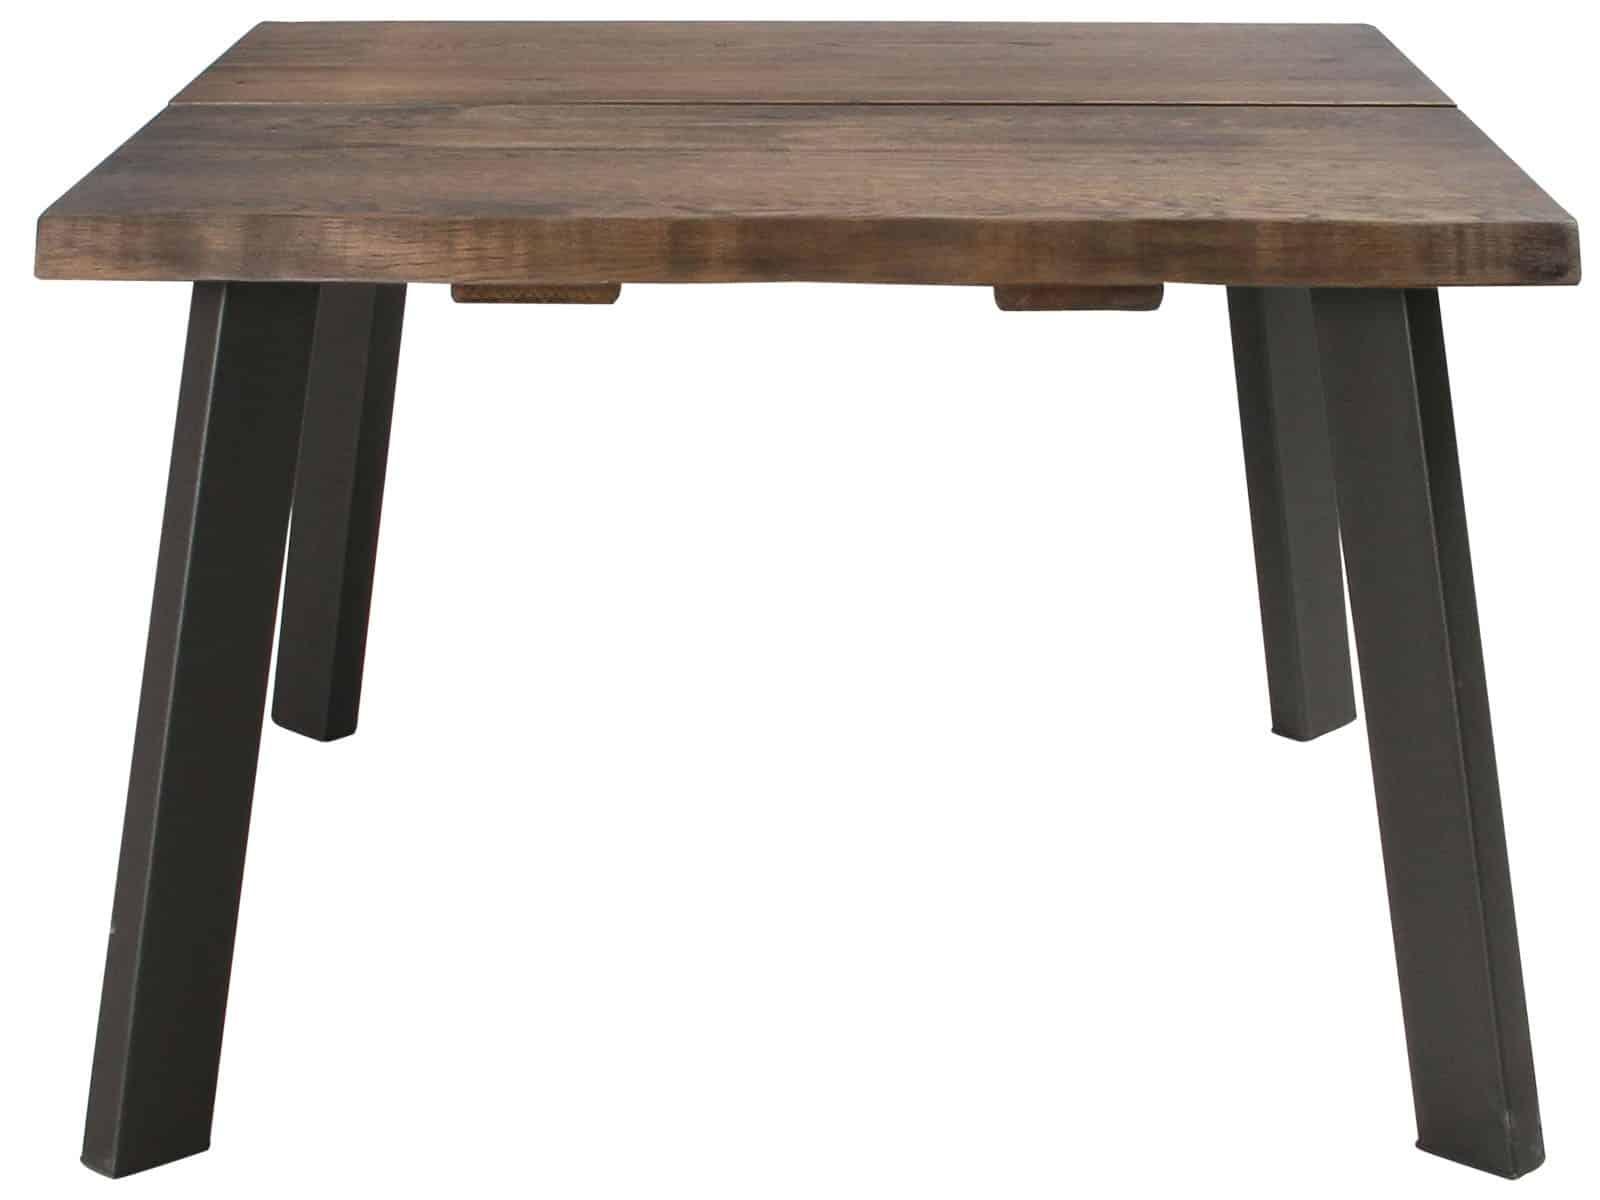 B4 bordben sat på sofabord